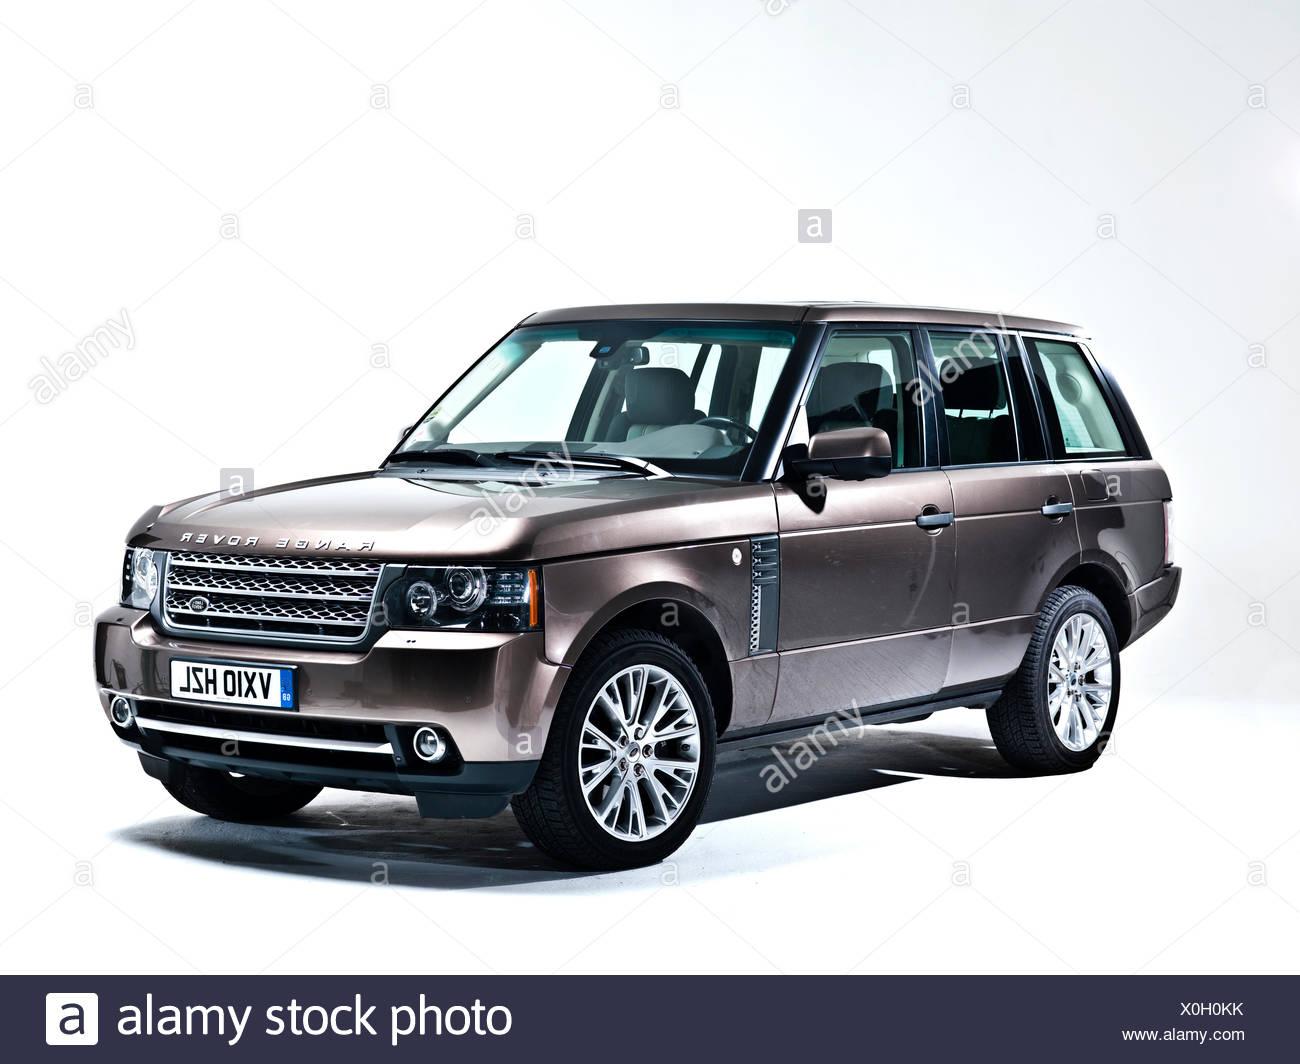 Third generation Range Rover, London, 19 11 2010 - Stock Image